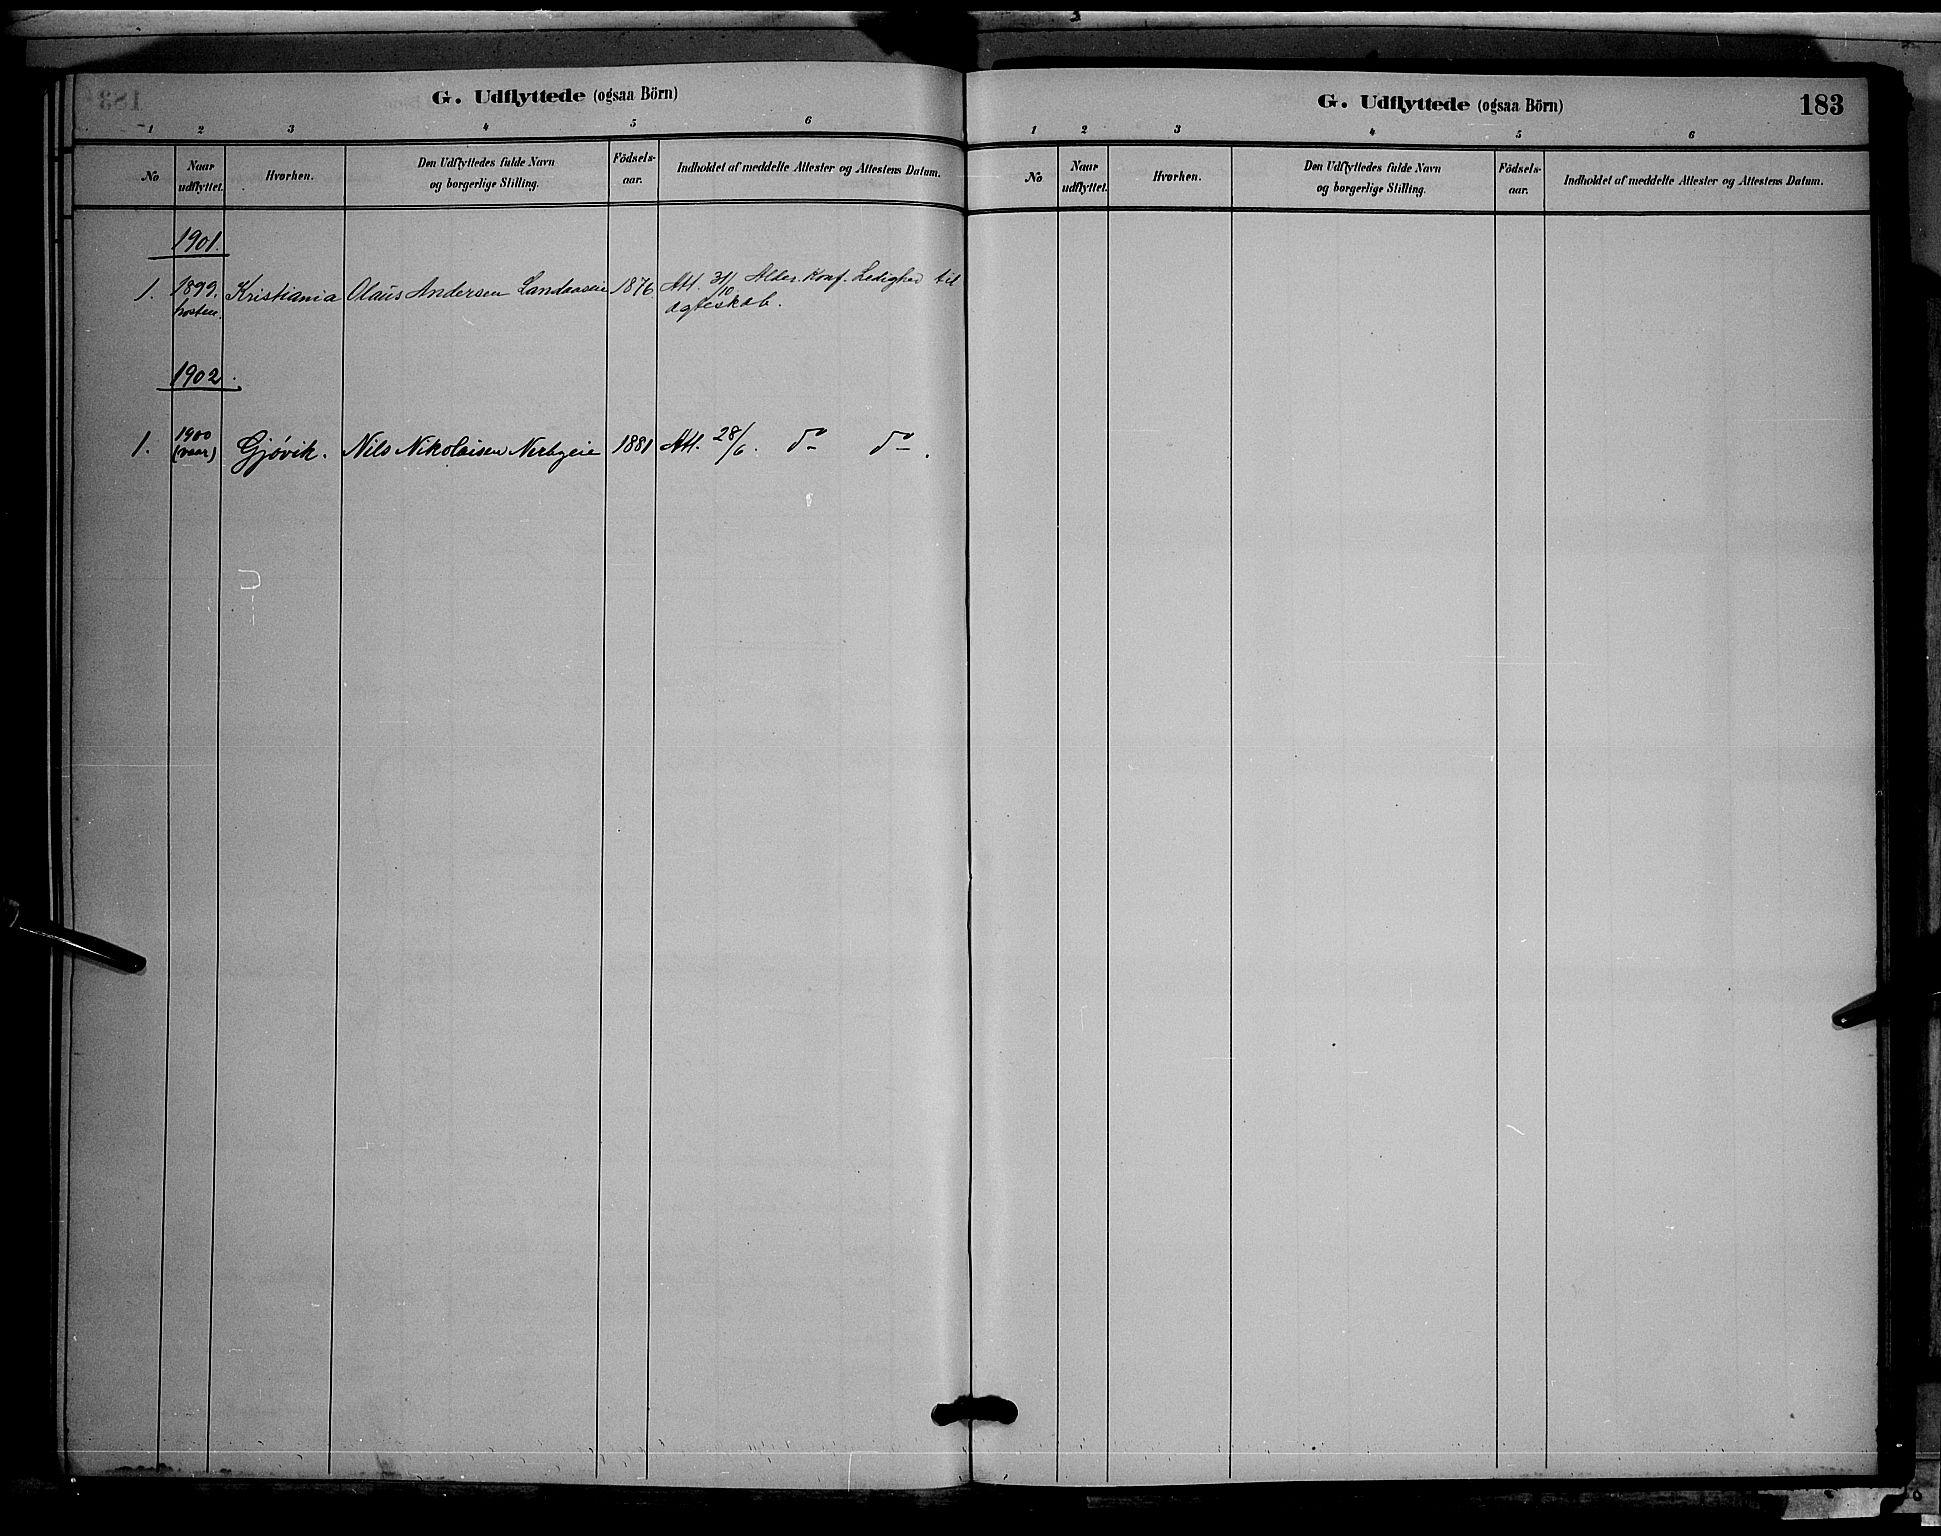 SAH, Søndre Land prestekontor, L/L0003: Klokkerbok nr. 3, 1884-1902, s. 183